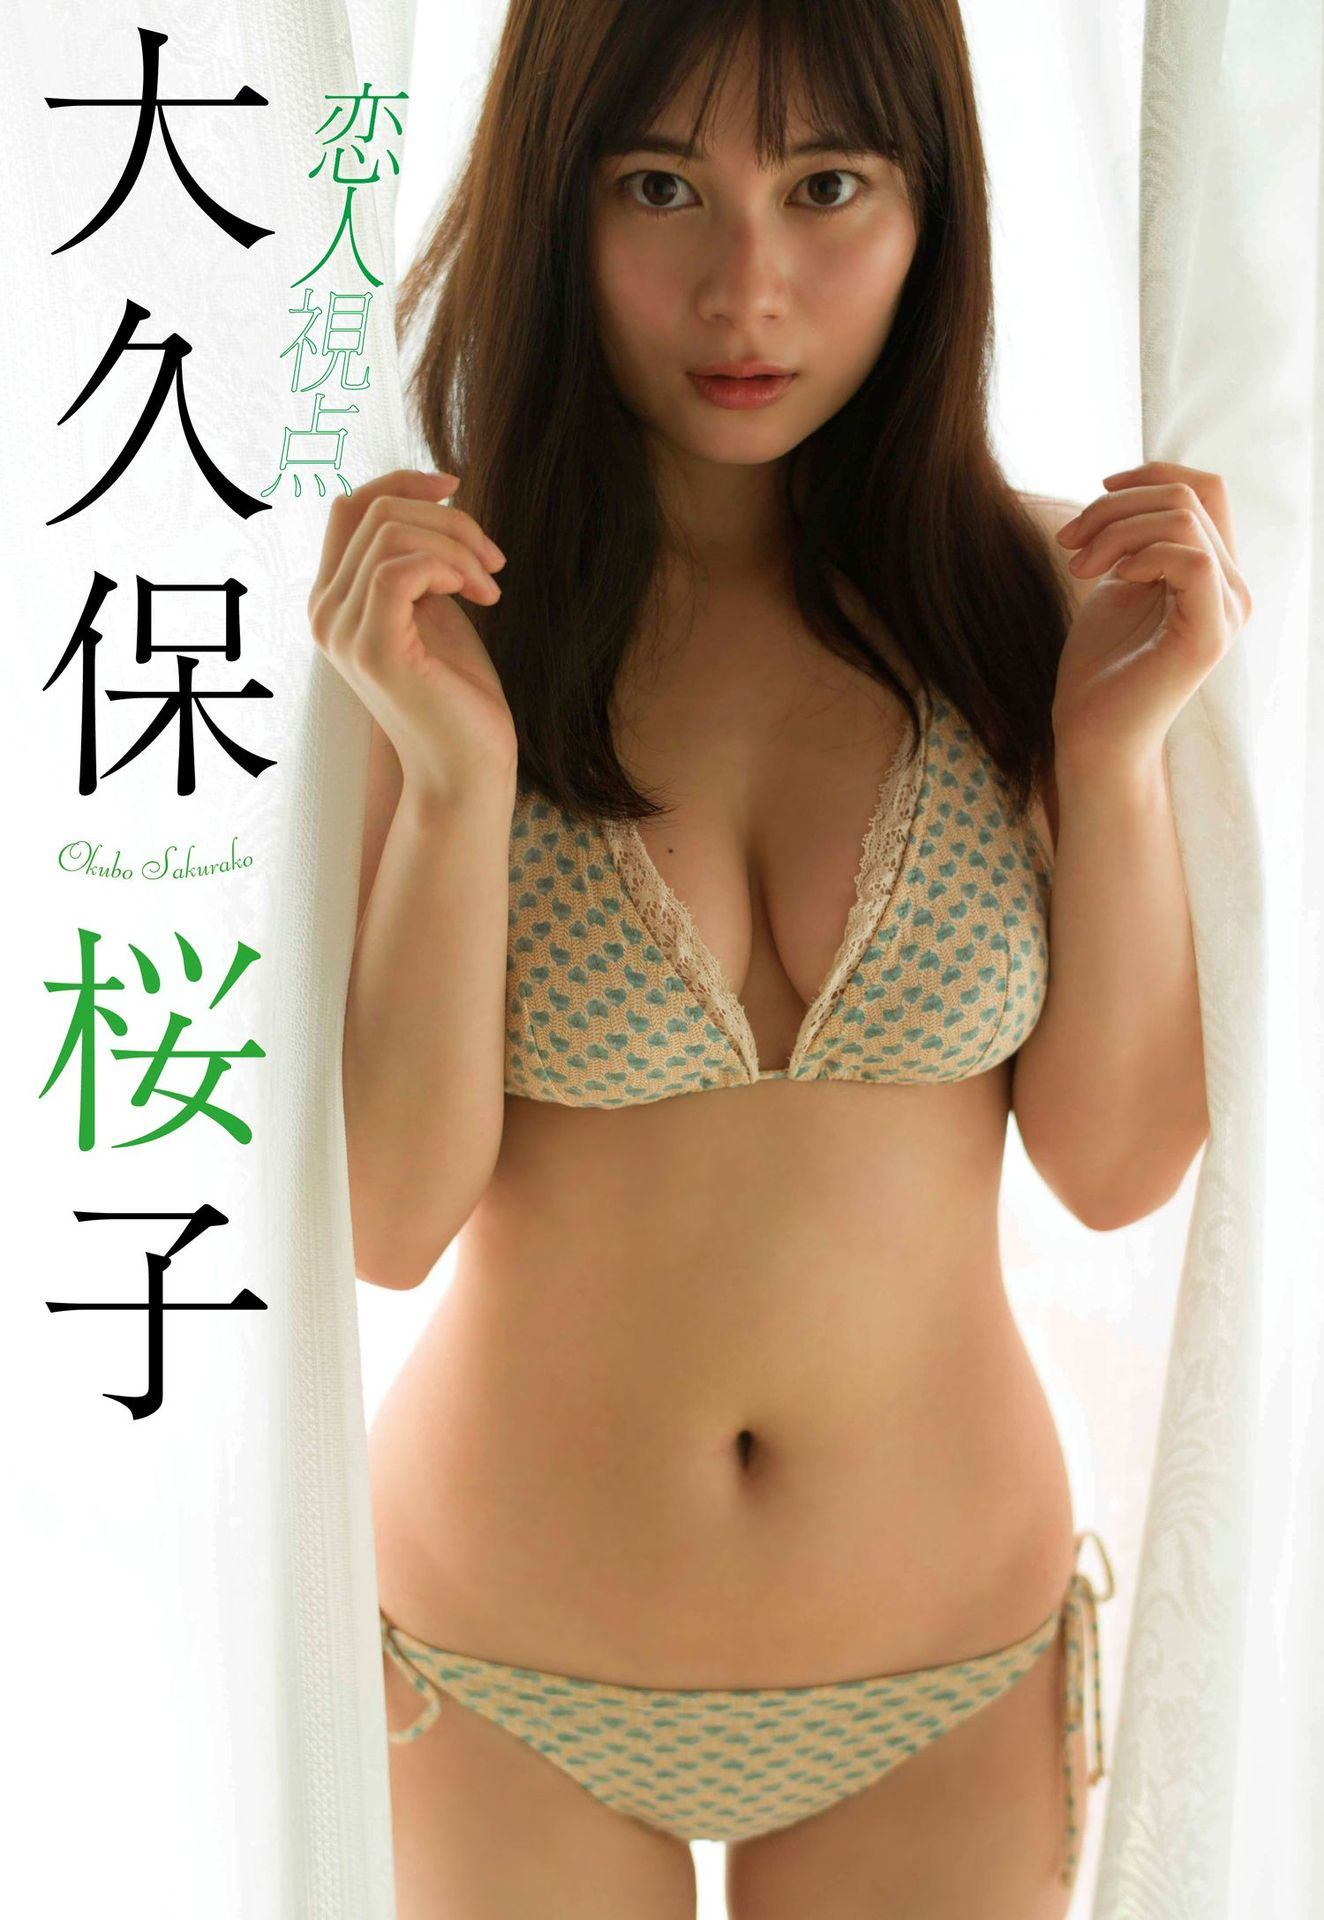 Weekly Playboy 大久保樱子恋人视点写真 美女写真 热图2